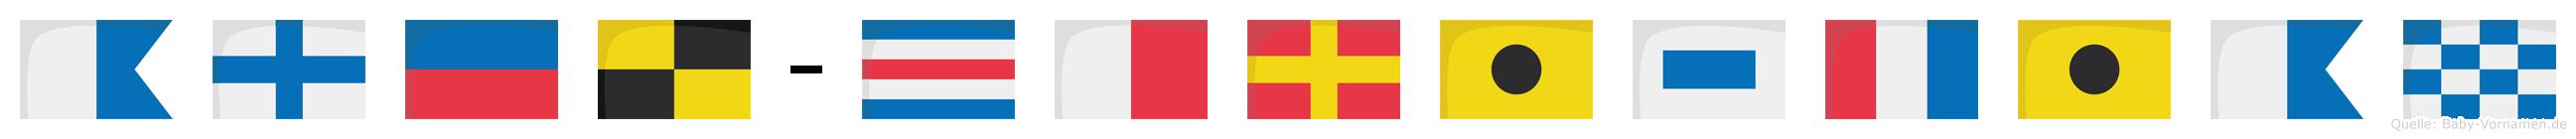 Axel-Christian im Flaggenalphabet